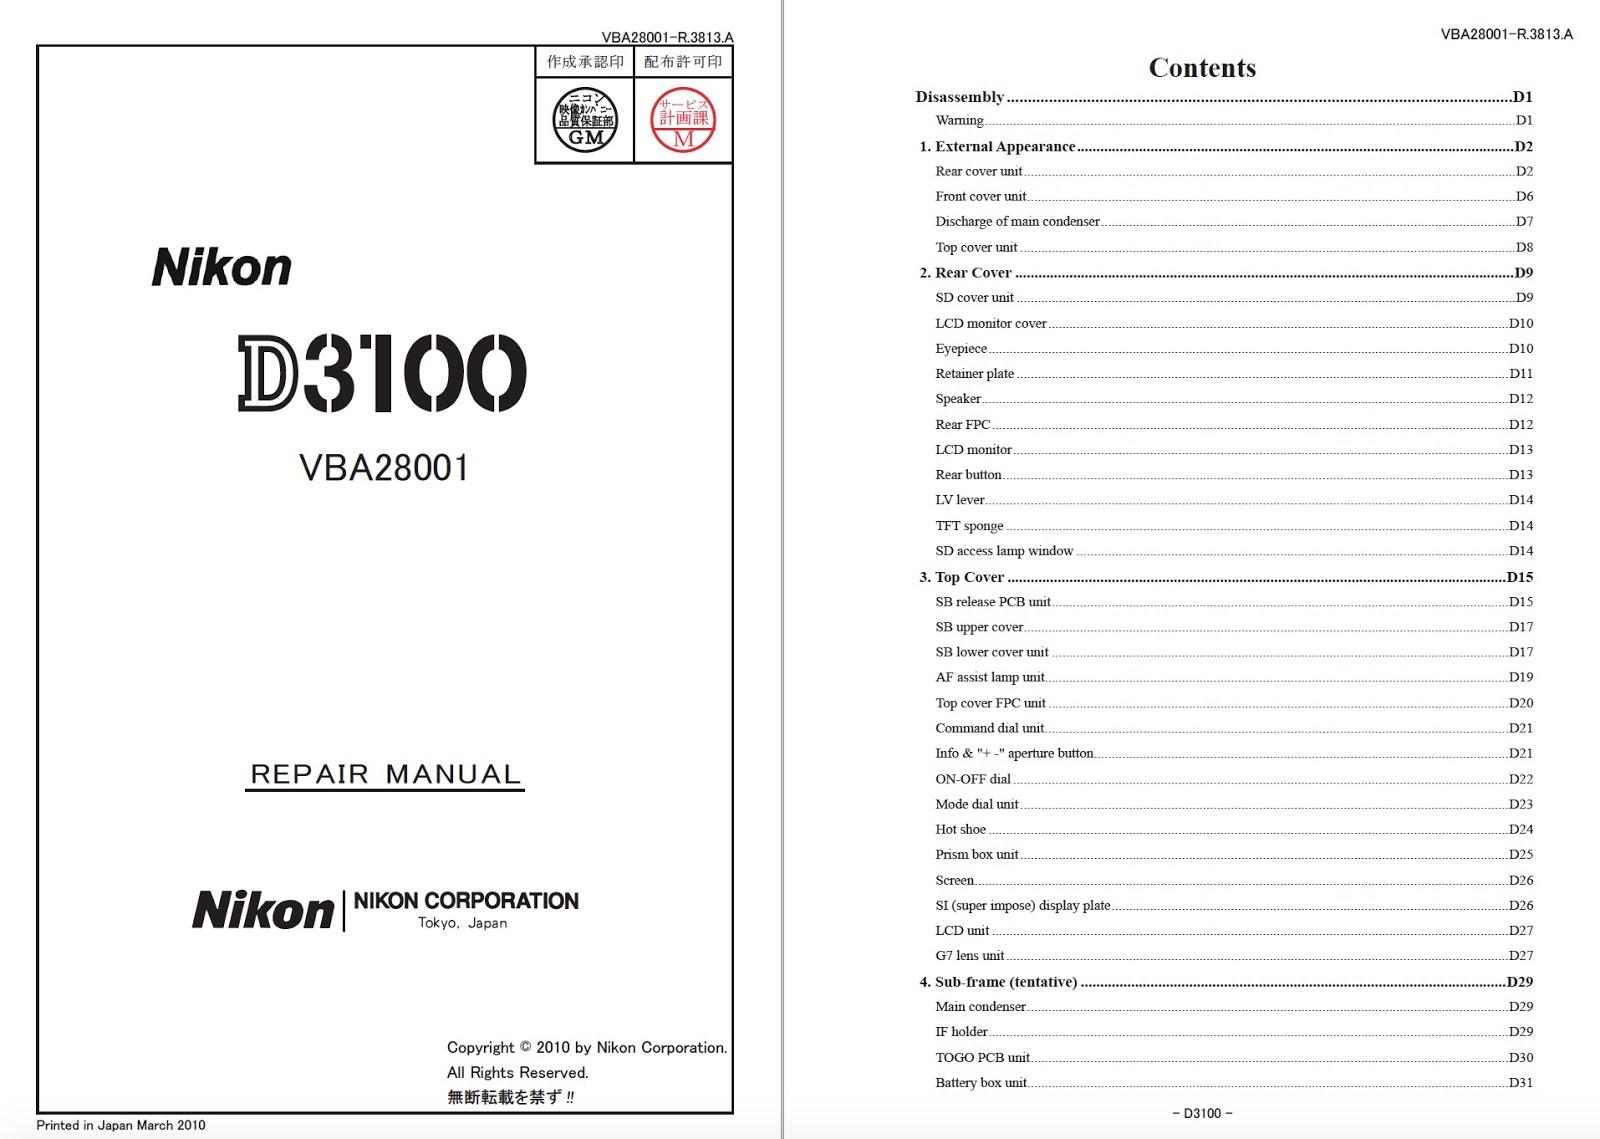 Nikon D3100 Camera Service Repair Manual Download Content: Service Repair  Manual File type: PDF File pages: 156. Language: ENGLISH Published year:  2010